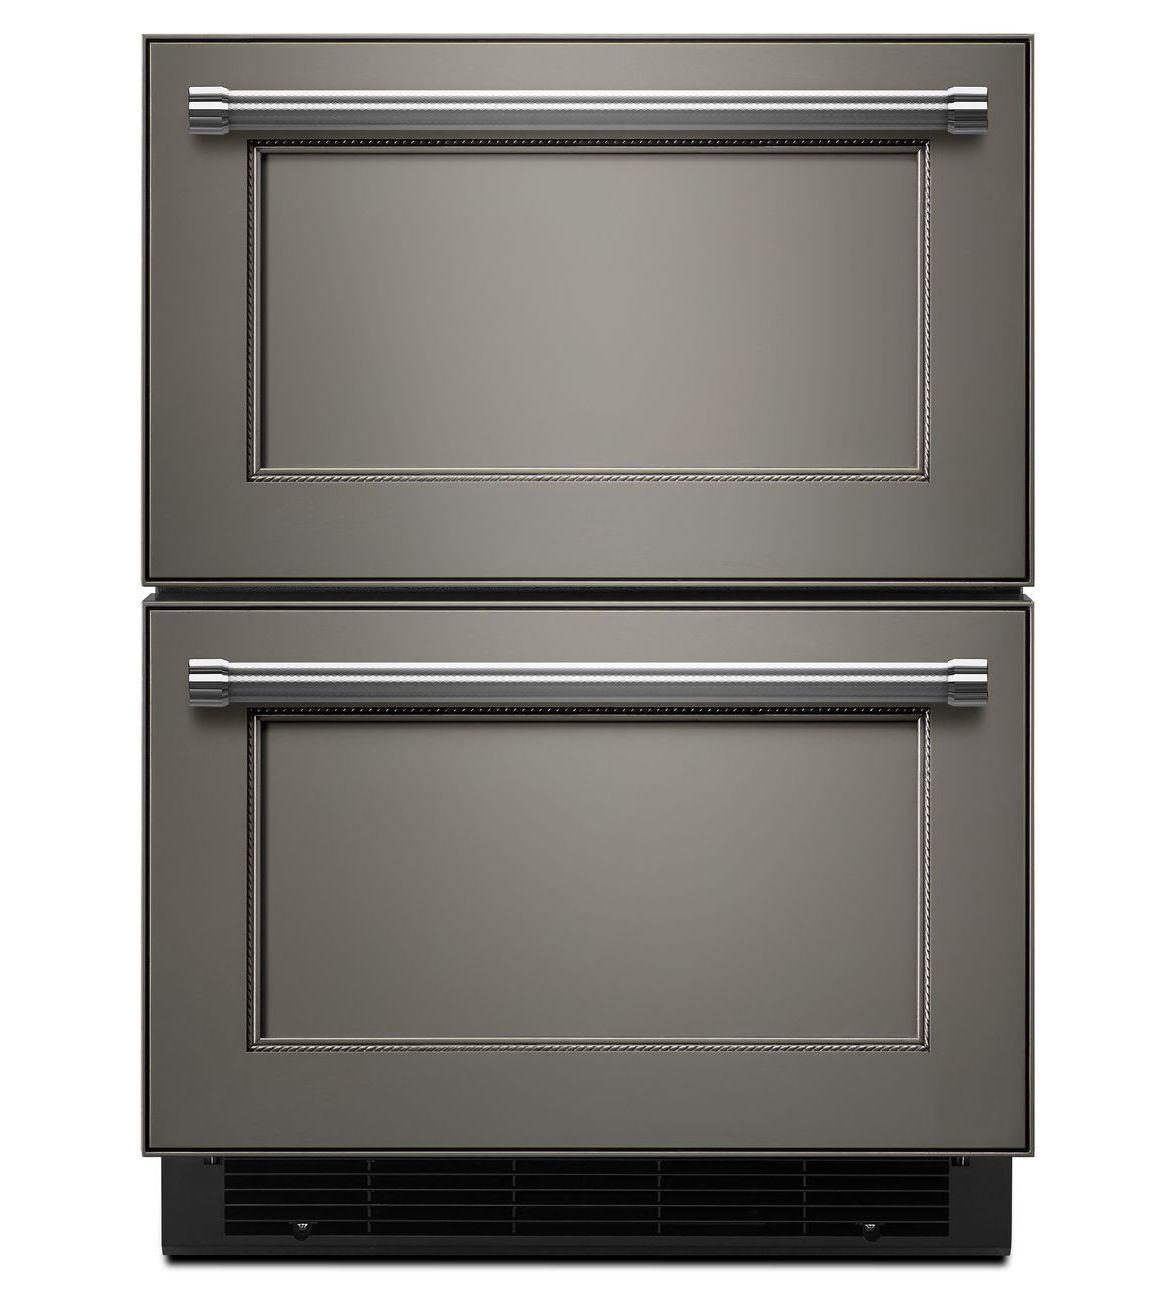 Kitchenaid Refrigerator Drawers: Compact Refrigerators